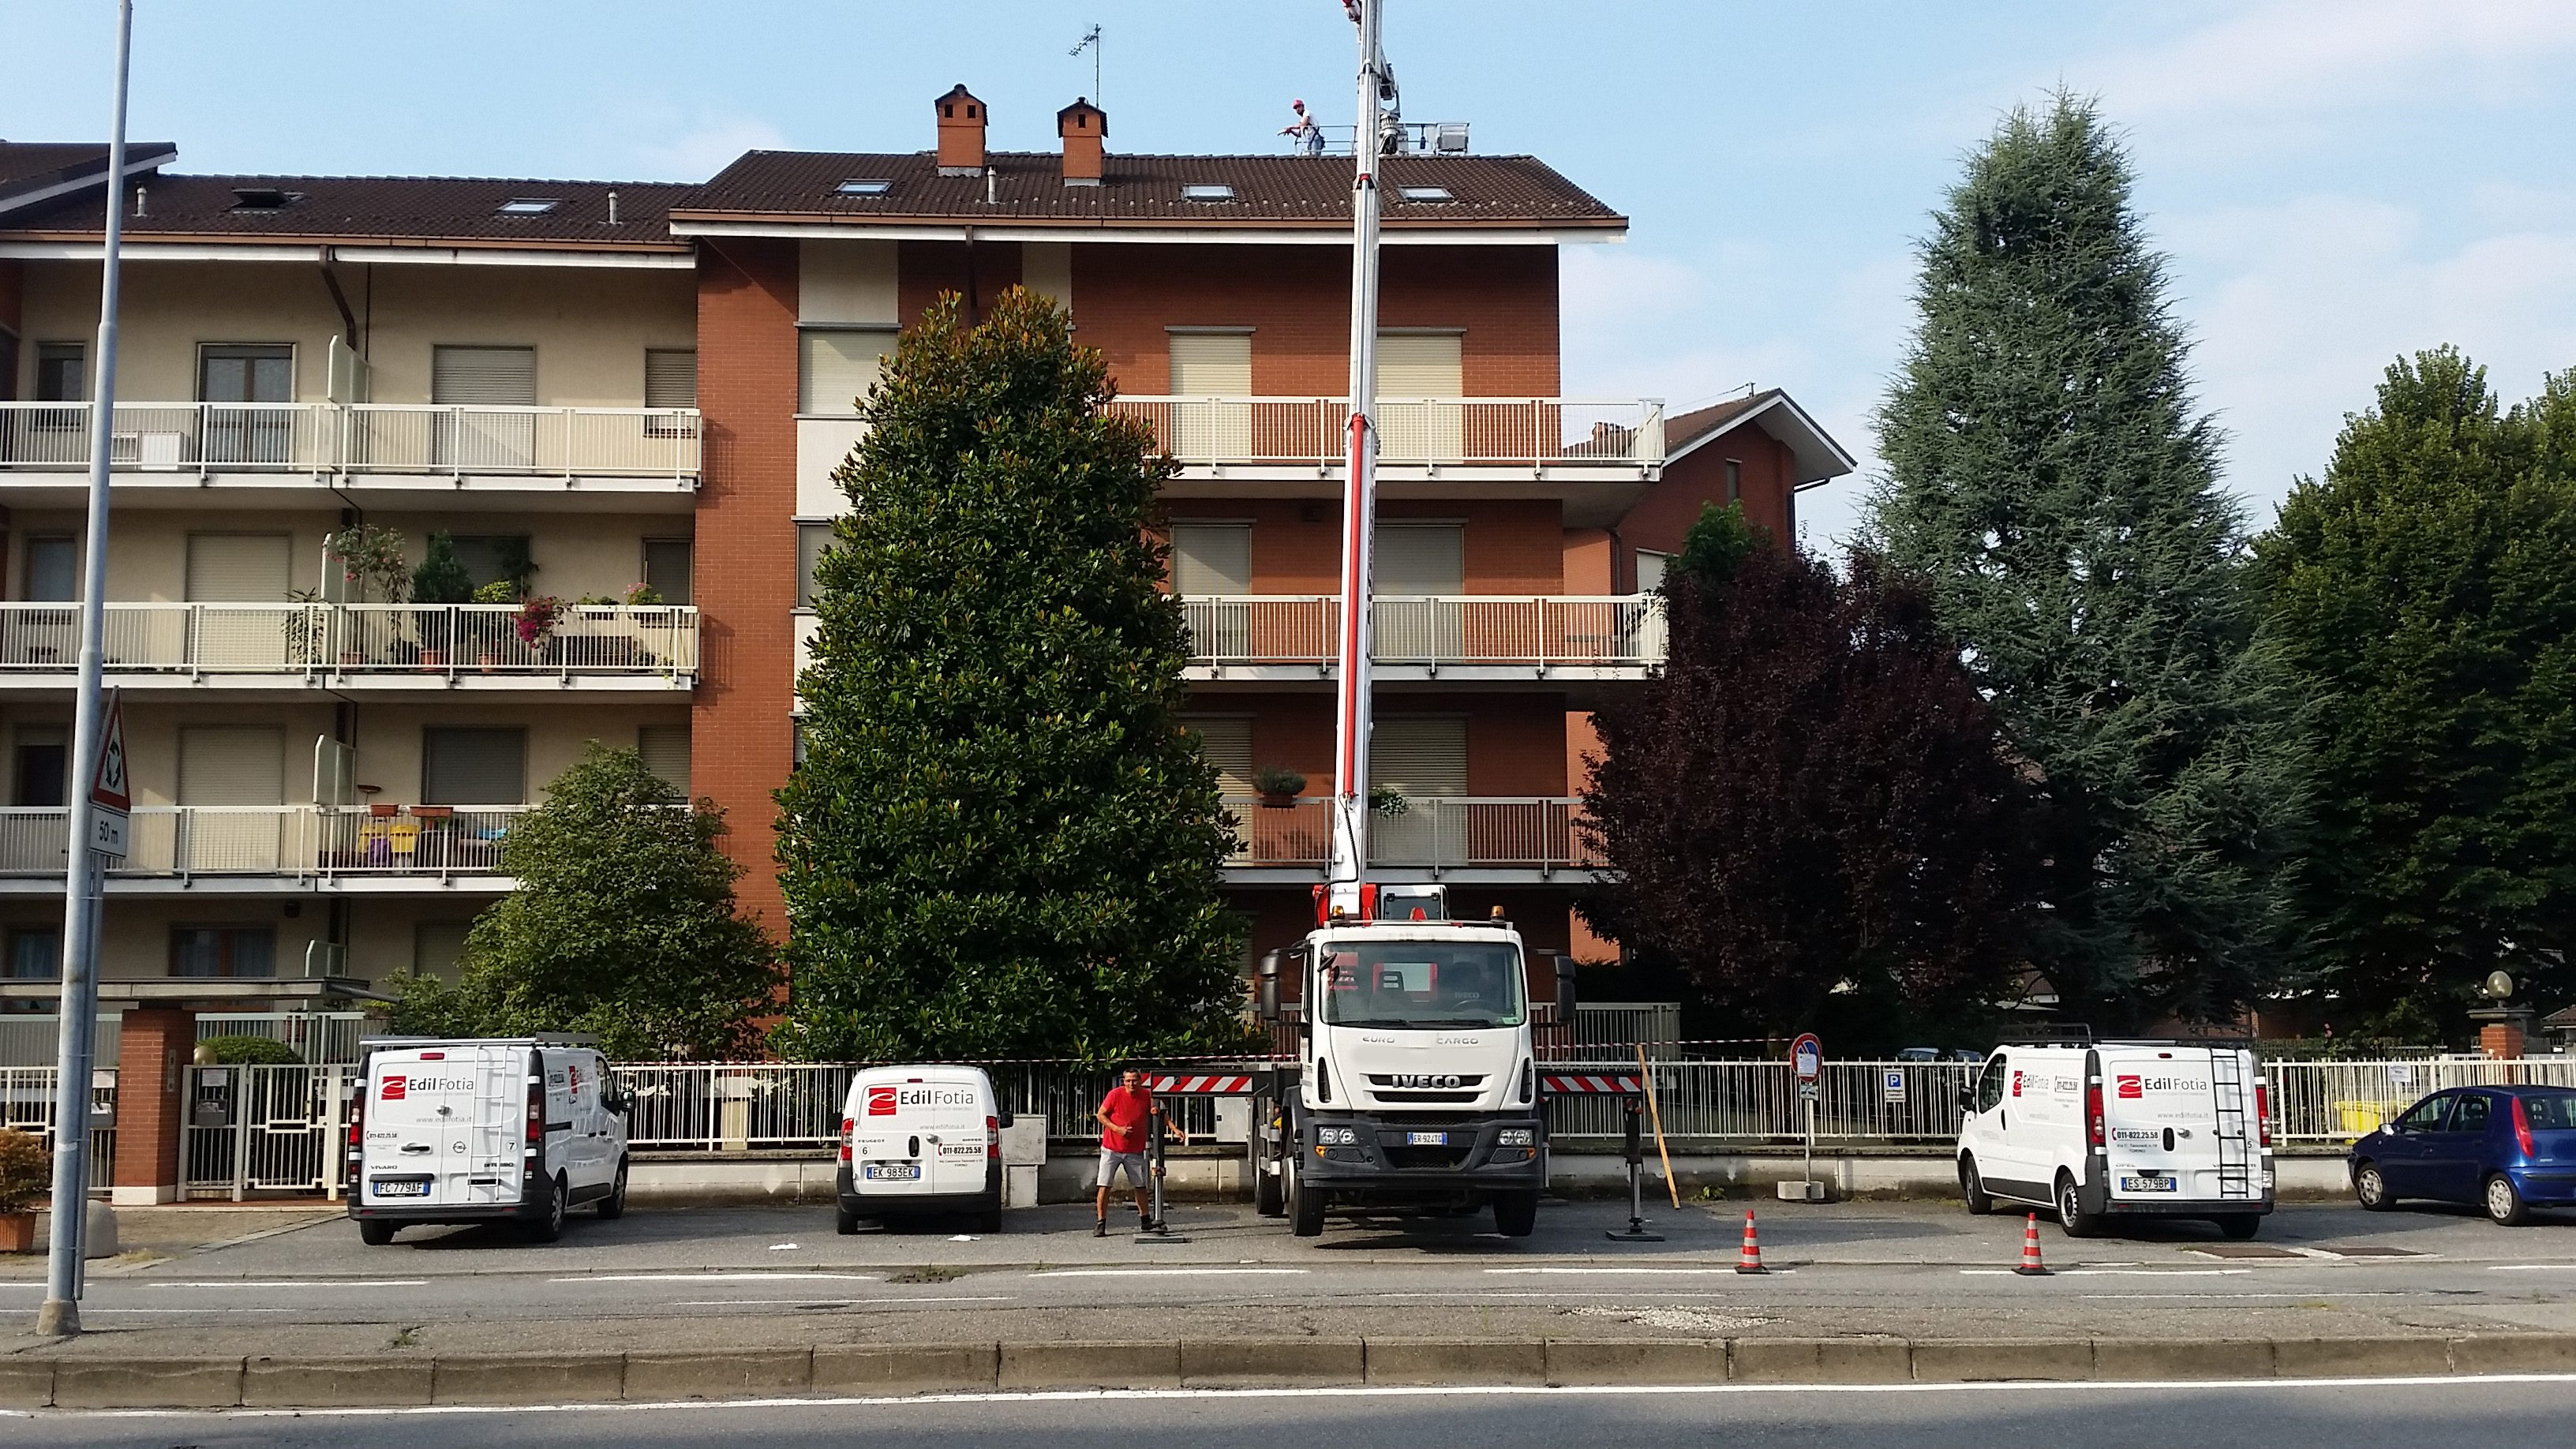 Via Aosta - San Mauro Torinese